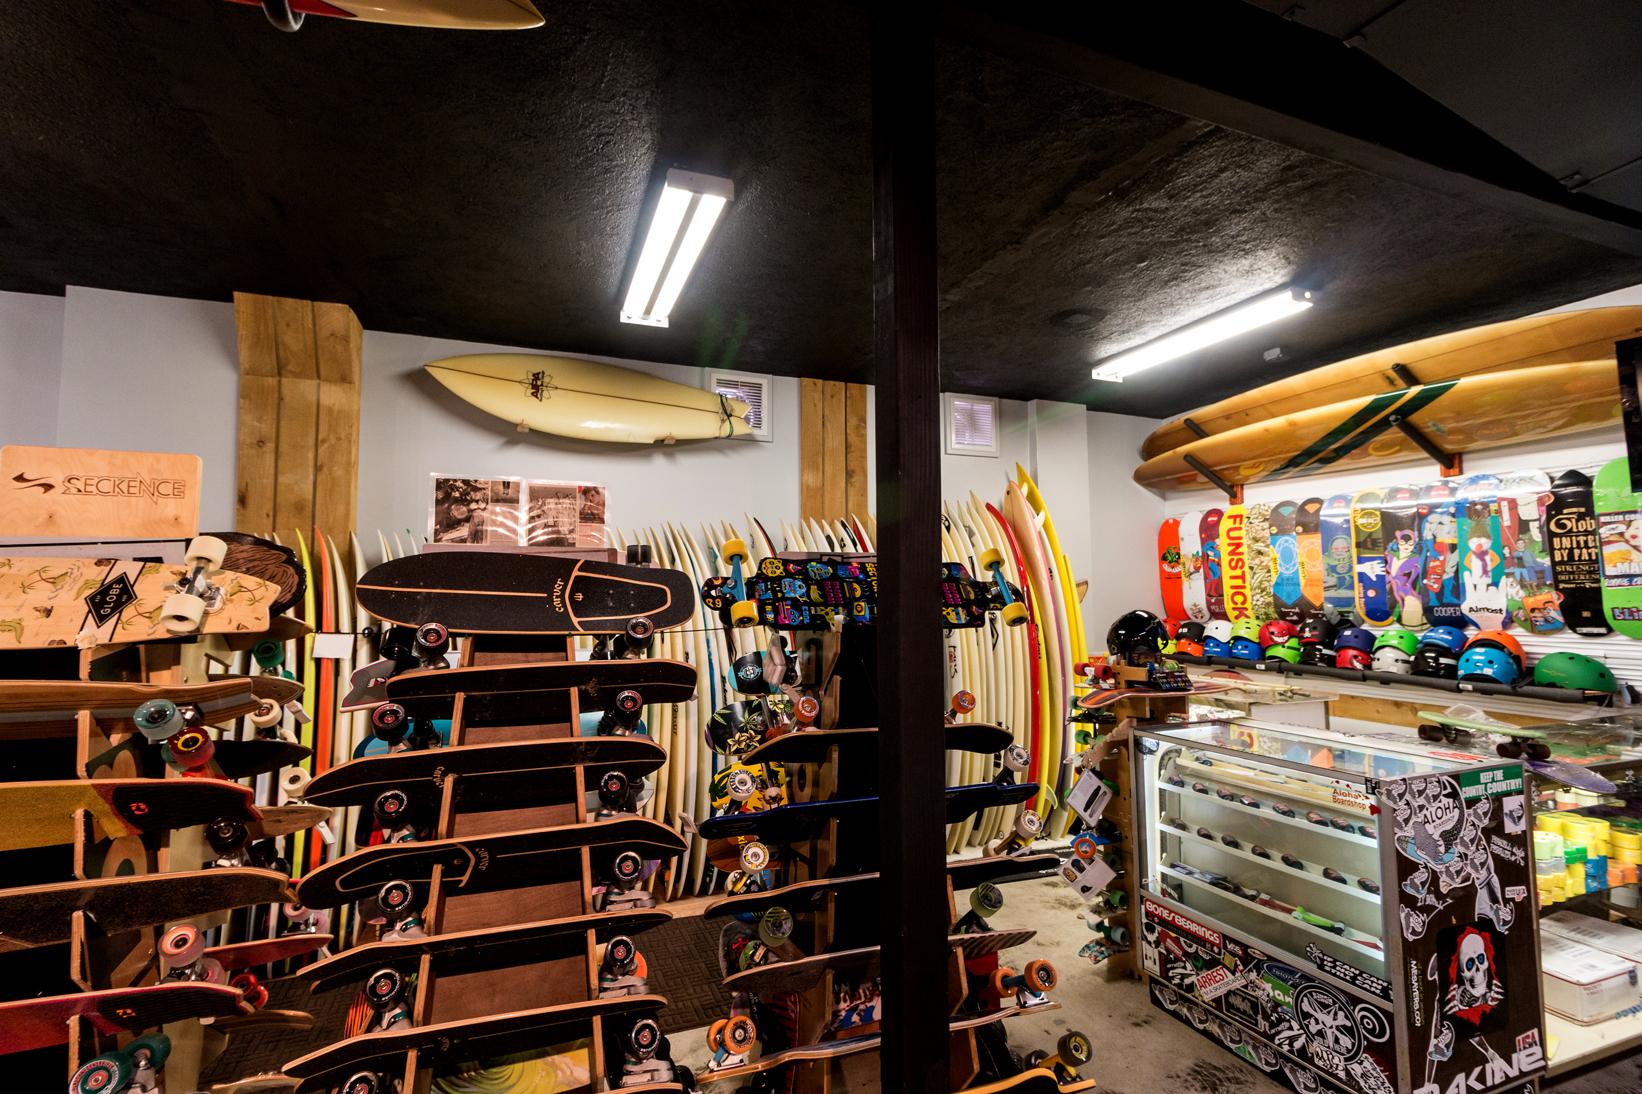 Surfboards, Surf Shop, Online Surf Shop, Snowboard Shop, Surf Clothing, Ladies Surf Clothing, Wetsuits, Wetsuit Accessories, Surfwear, Surf Boards, Boardshop.